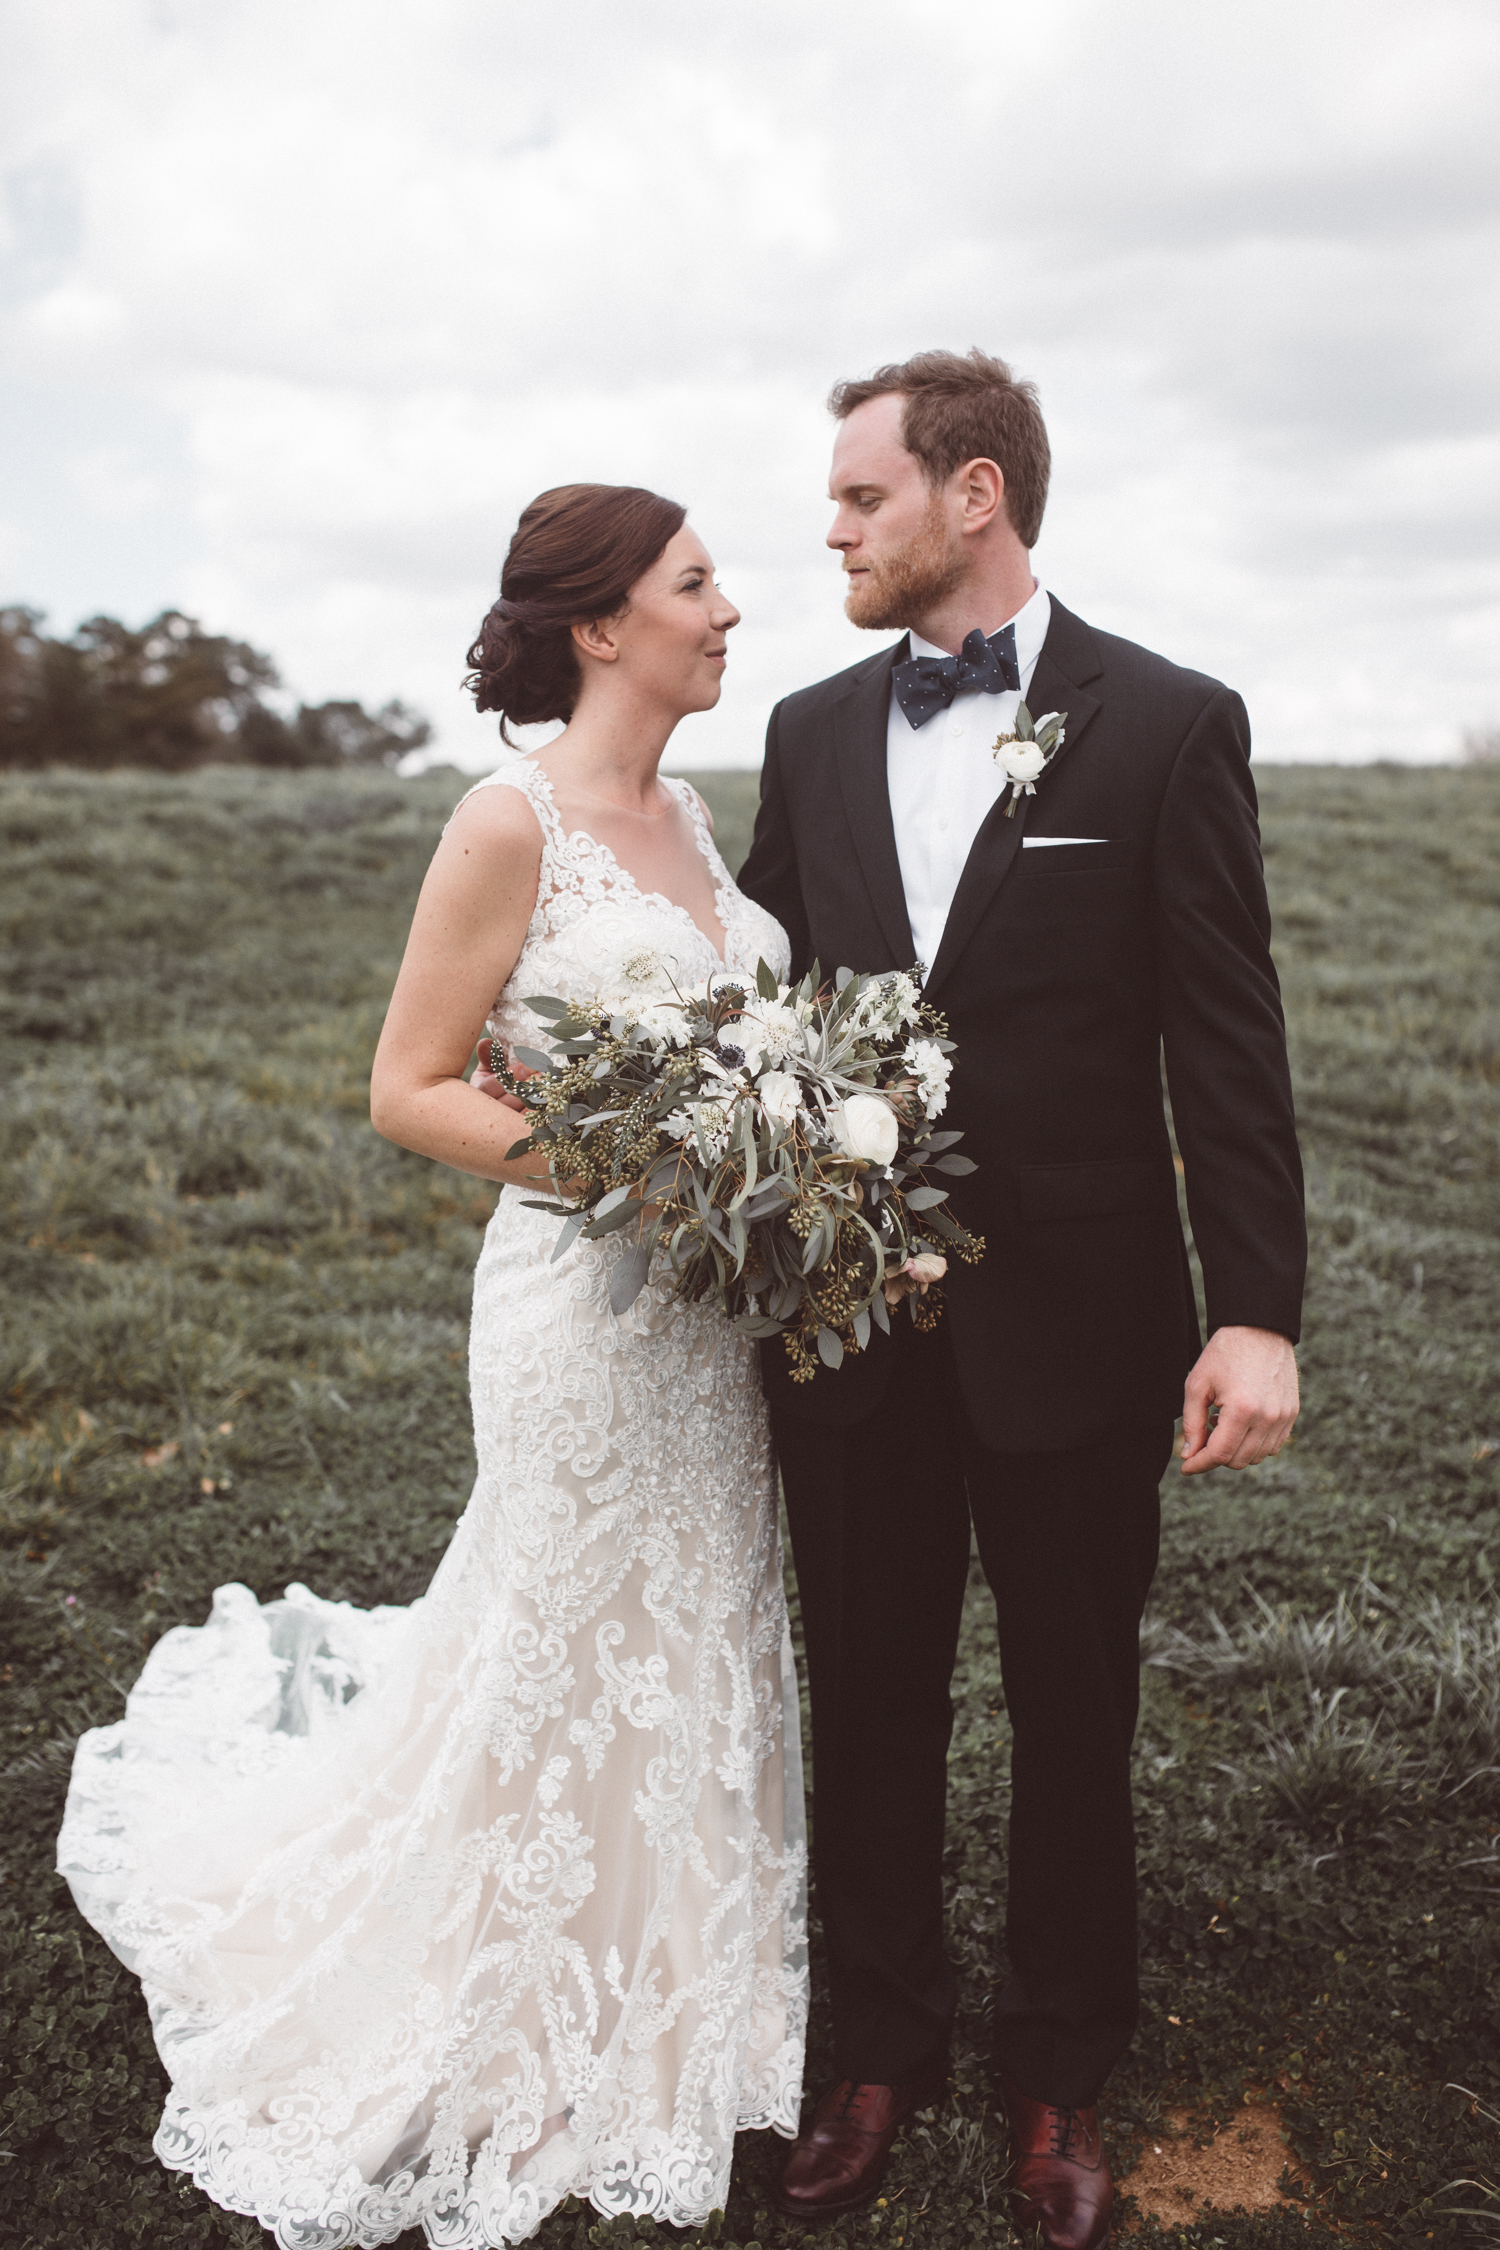 KDP_lindsey&taylor_wedding-263.JPG